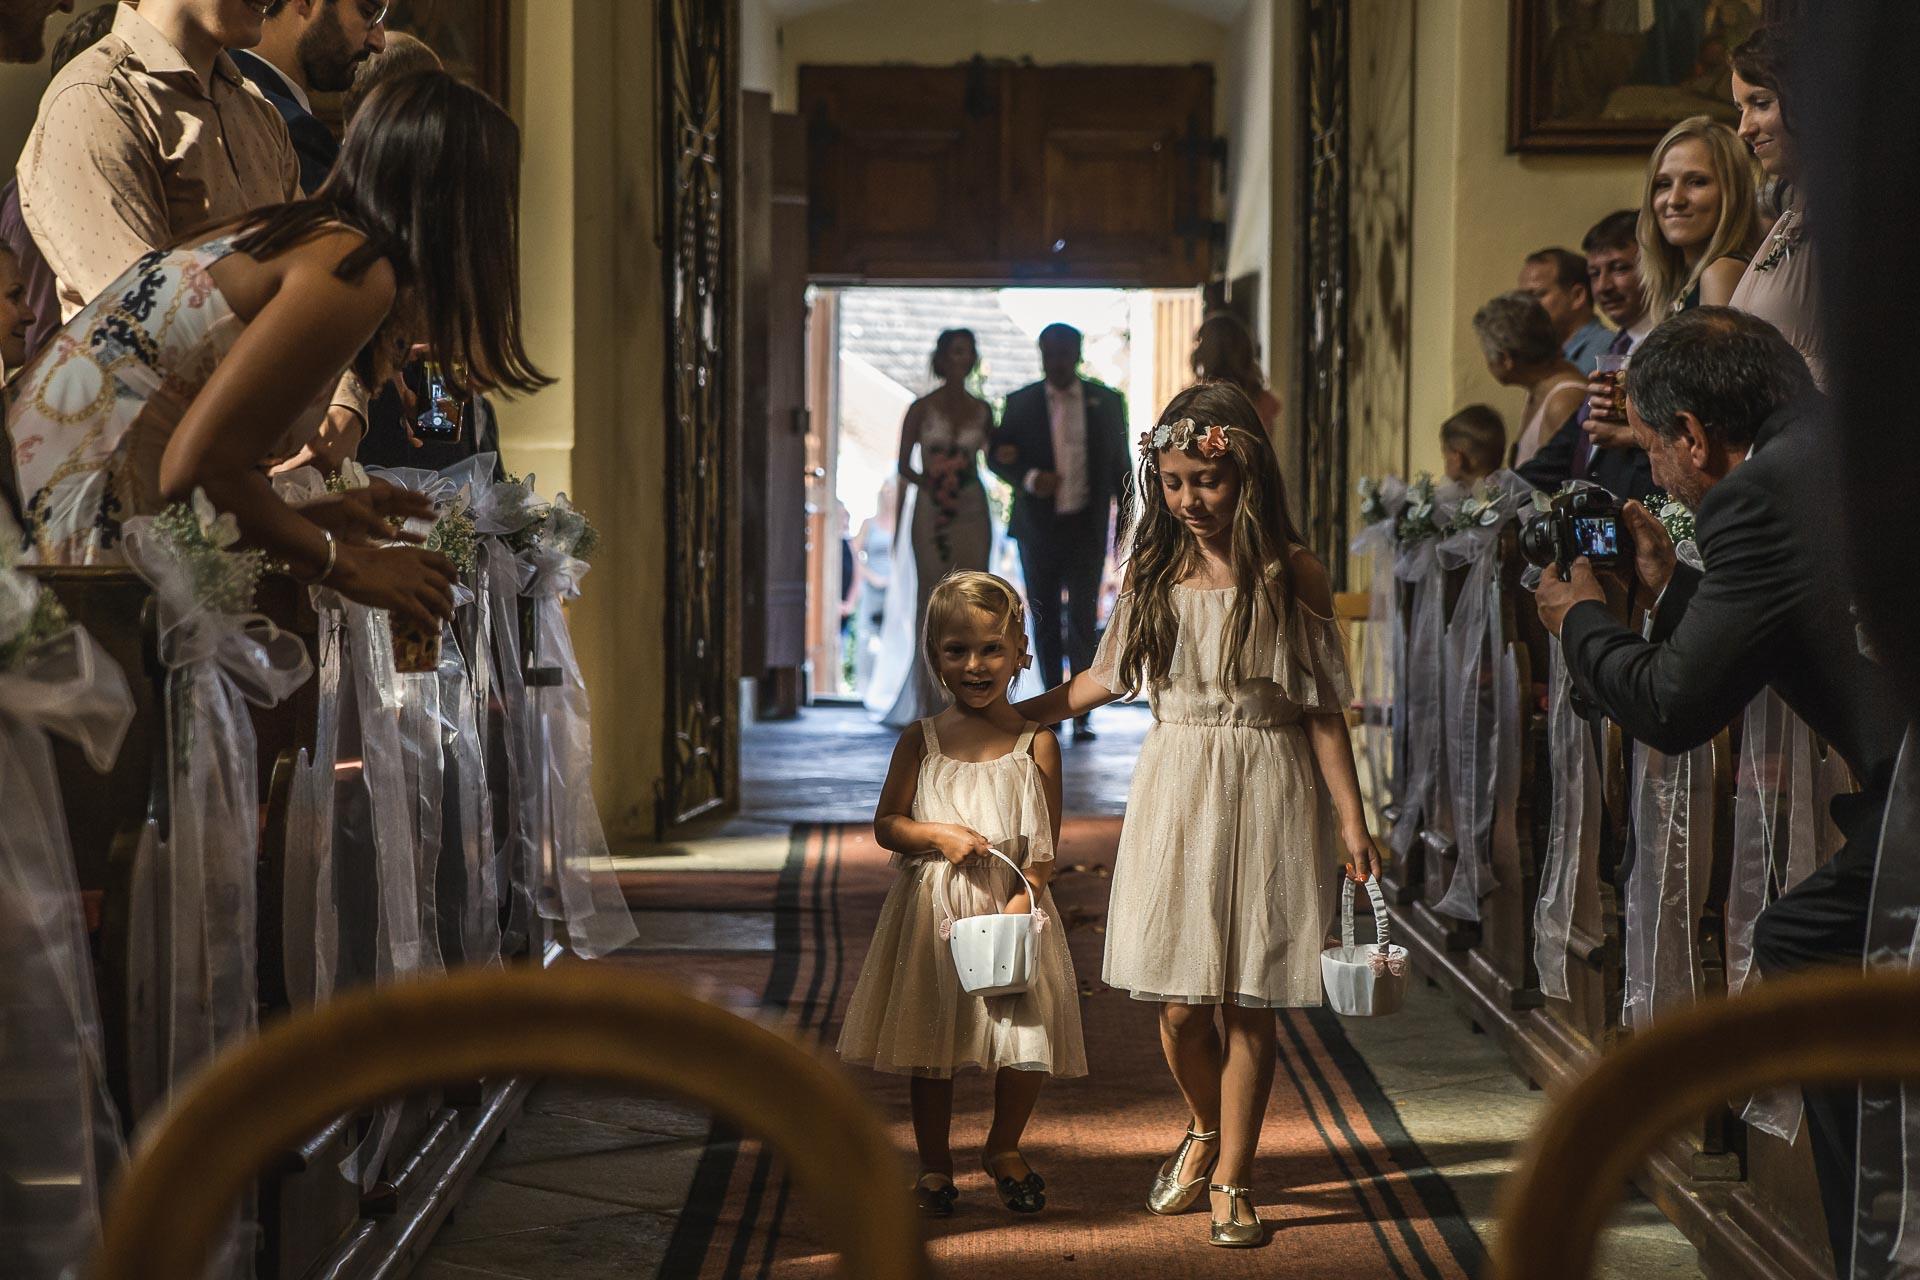 svatební-fotograf-wedding-svatebni-video-orlík-vltava-kostel-statek-stodola-boho-svatba-Beautyfoto-190